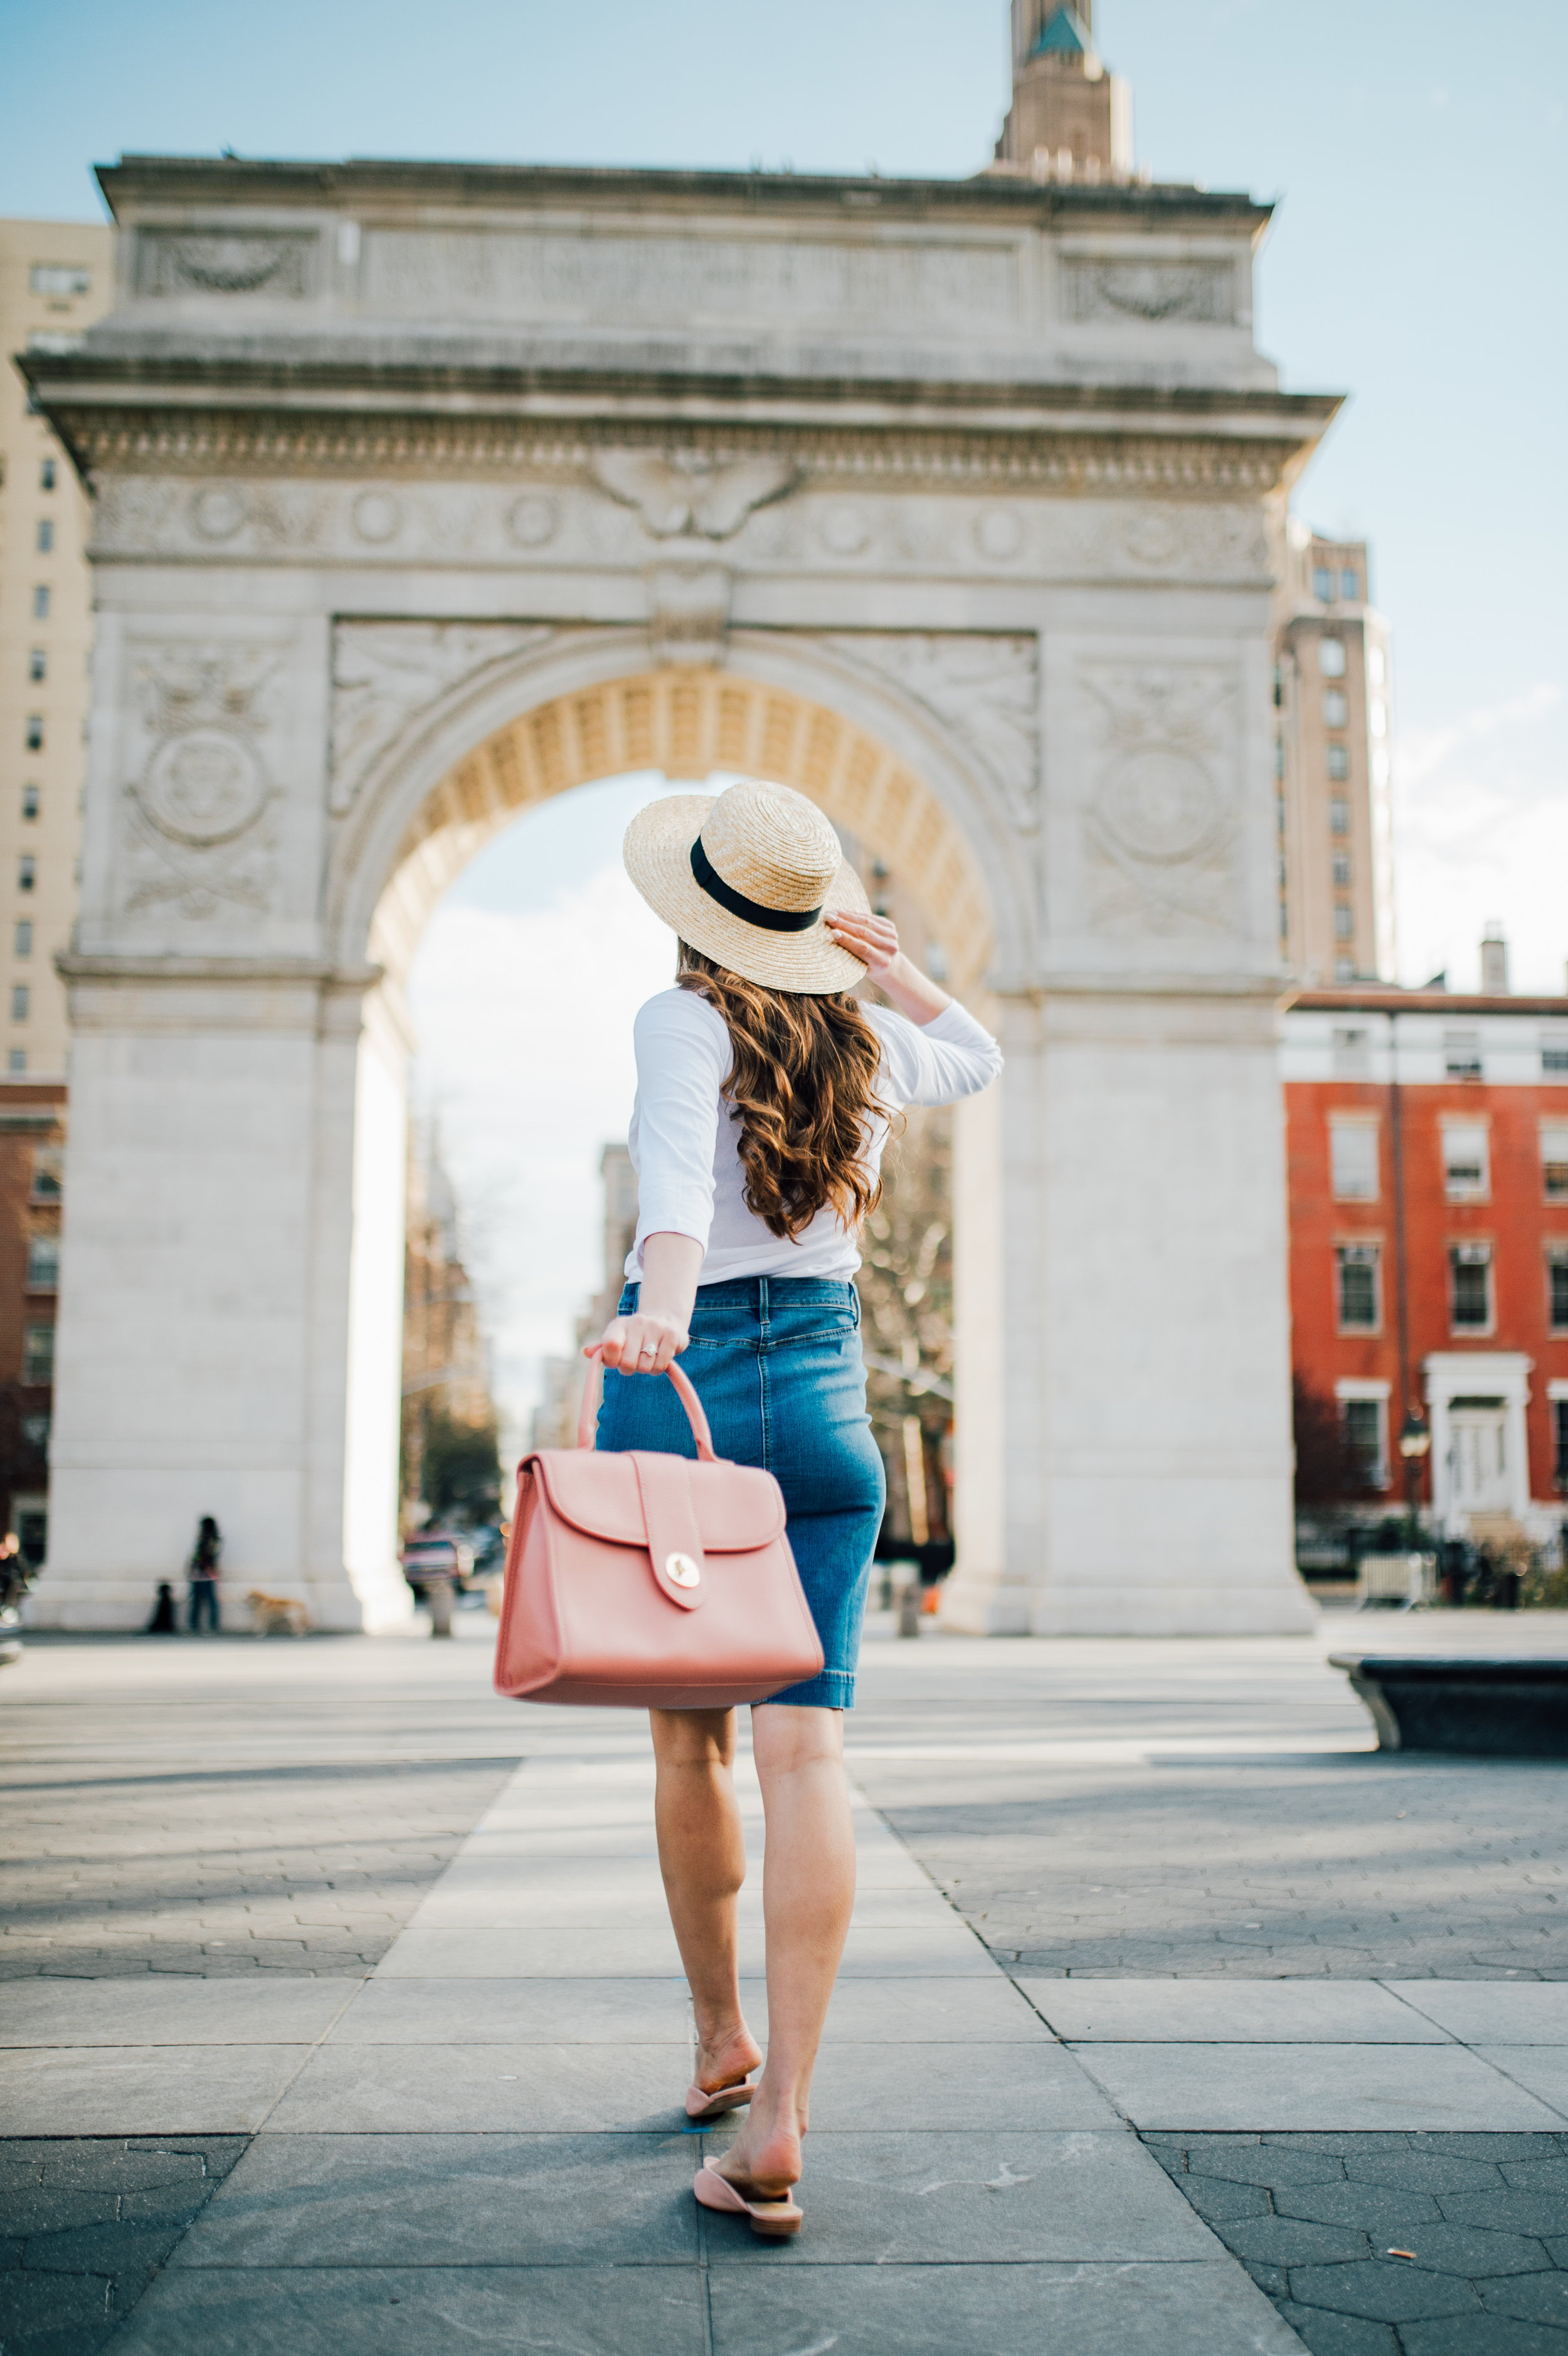 New York fashion photography by popular NYC fashion photographer Laurel Creative